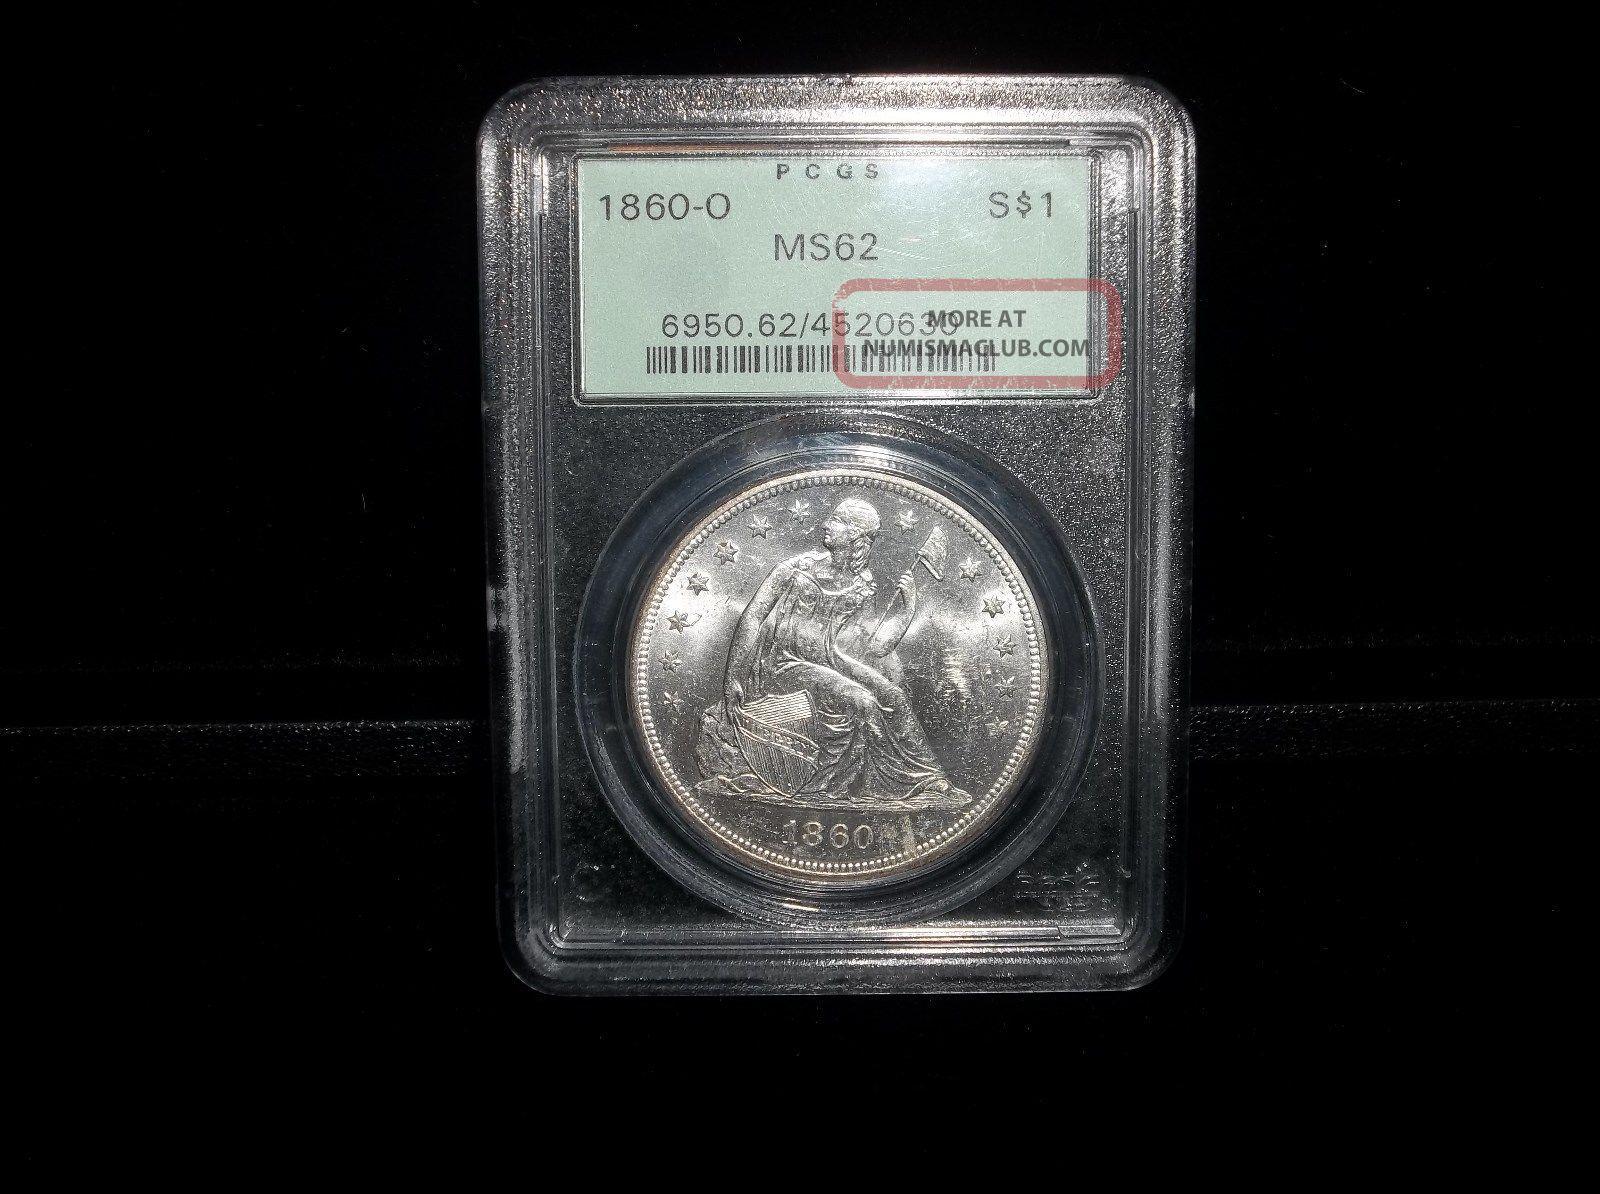 1860 - O $1 Pcgs Ms62 Liberty Seated Dollar - Ogh Dollars photo